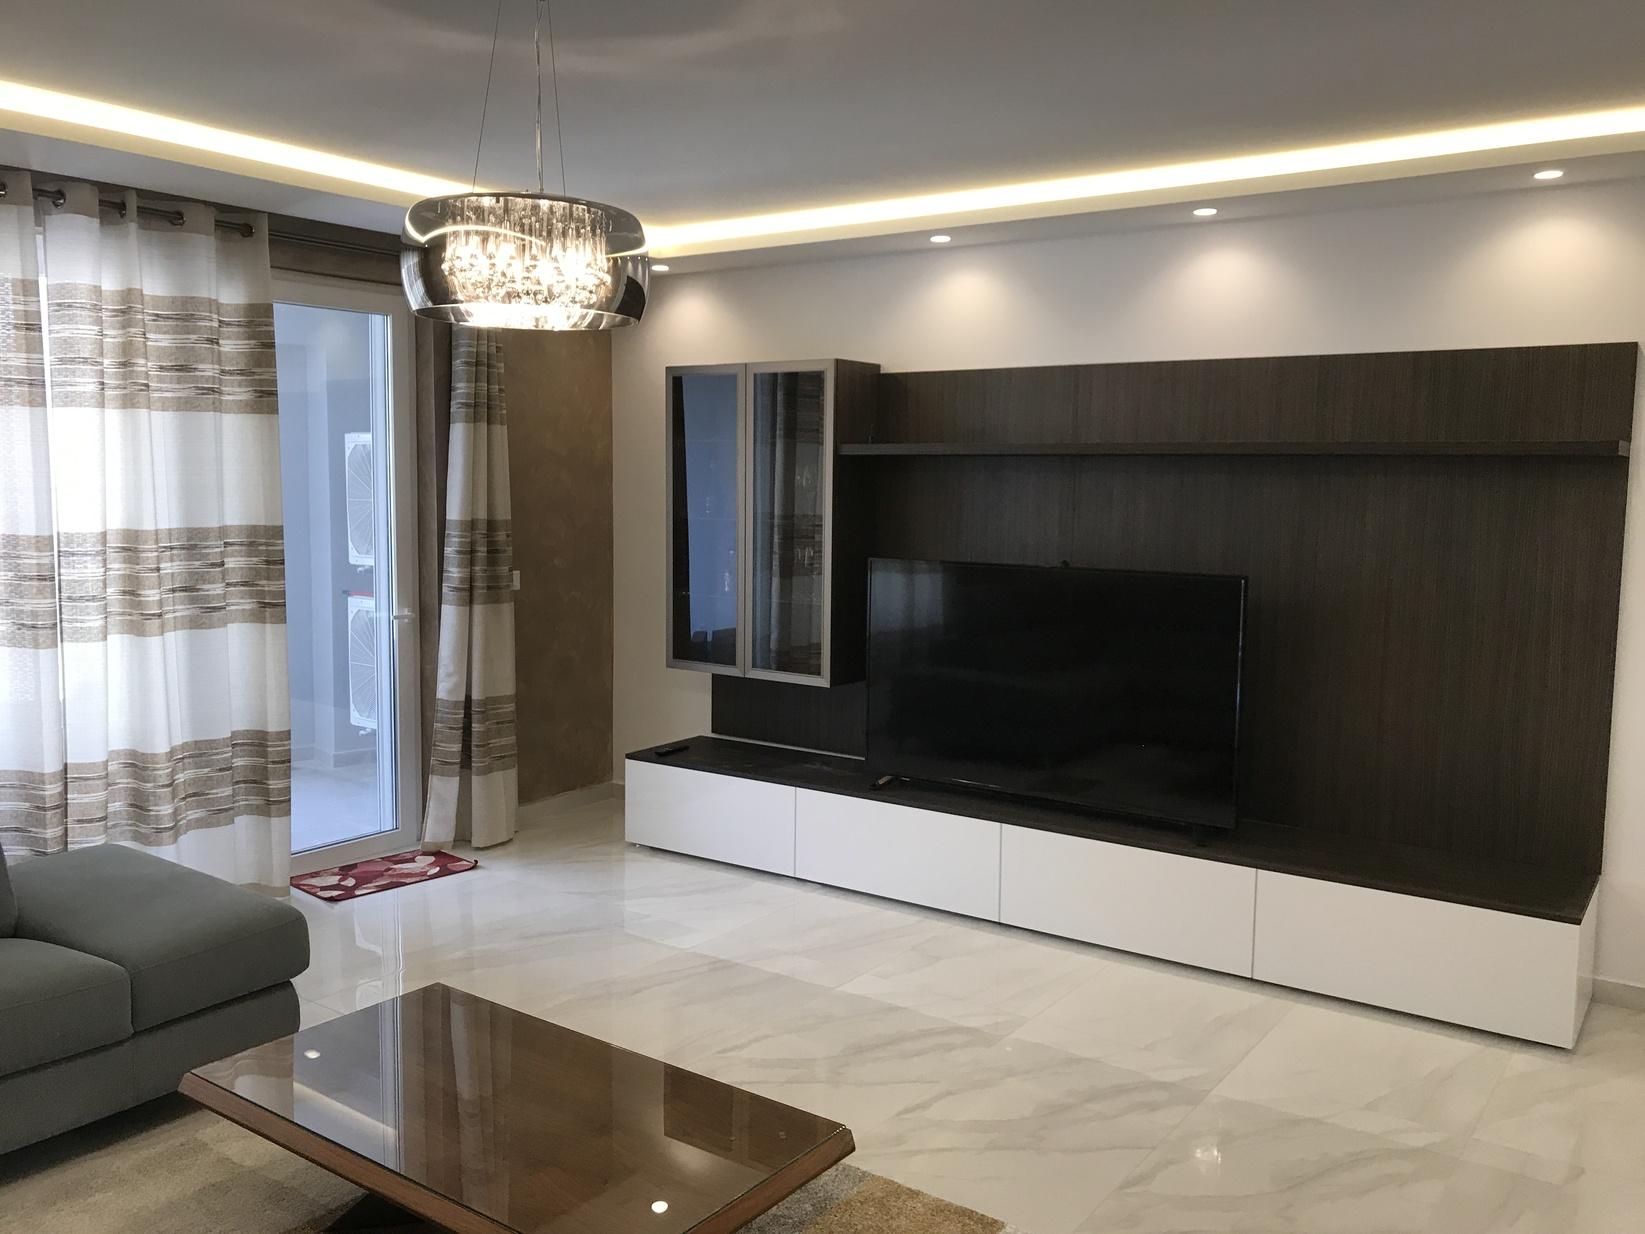 3 bed Apartment For Rent in Qawra, Qawra - thumb 6